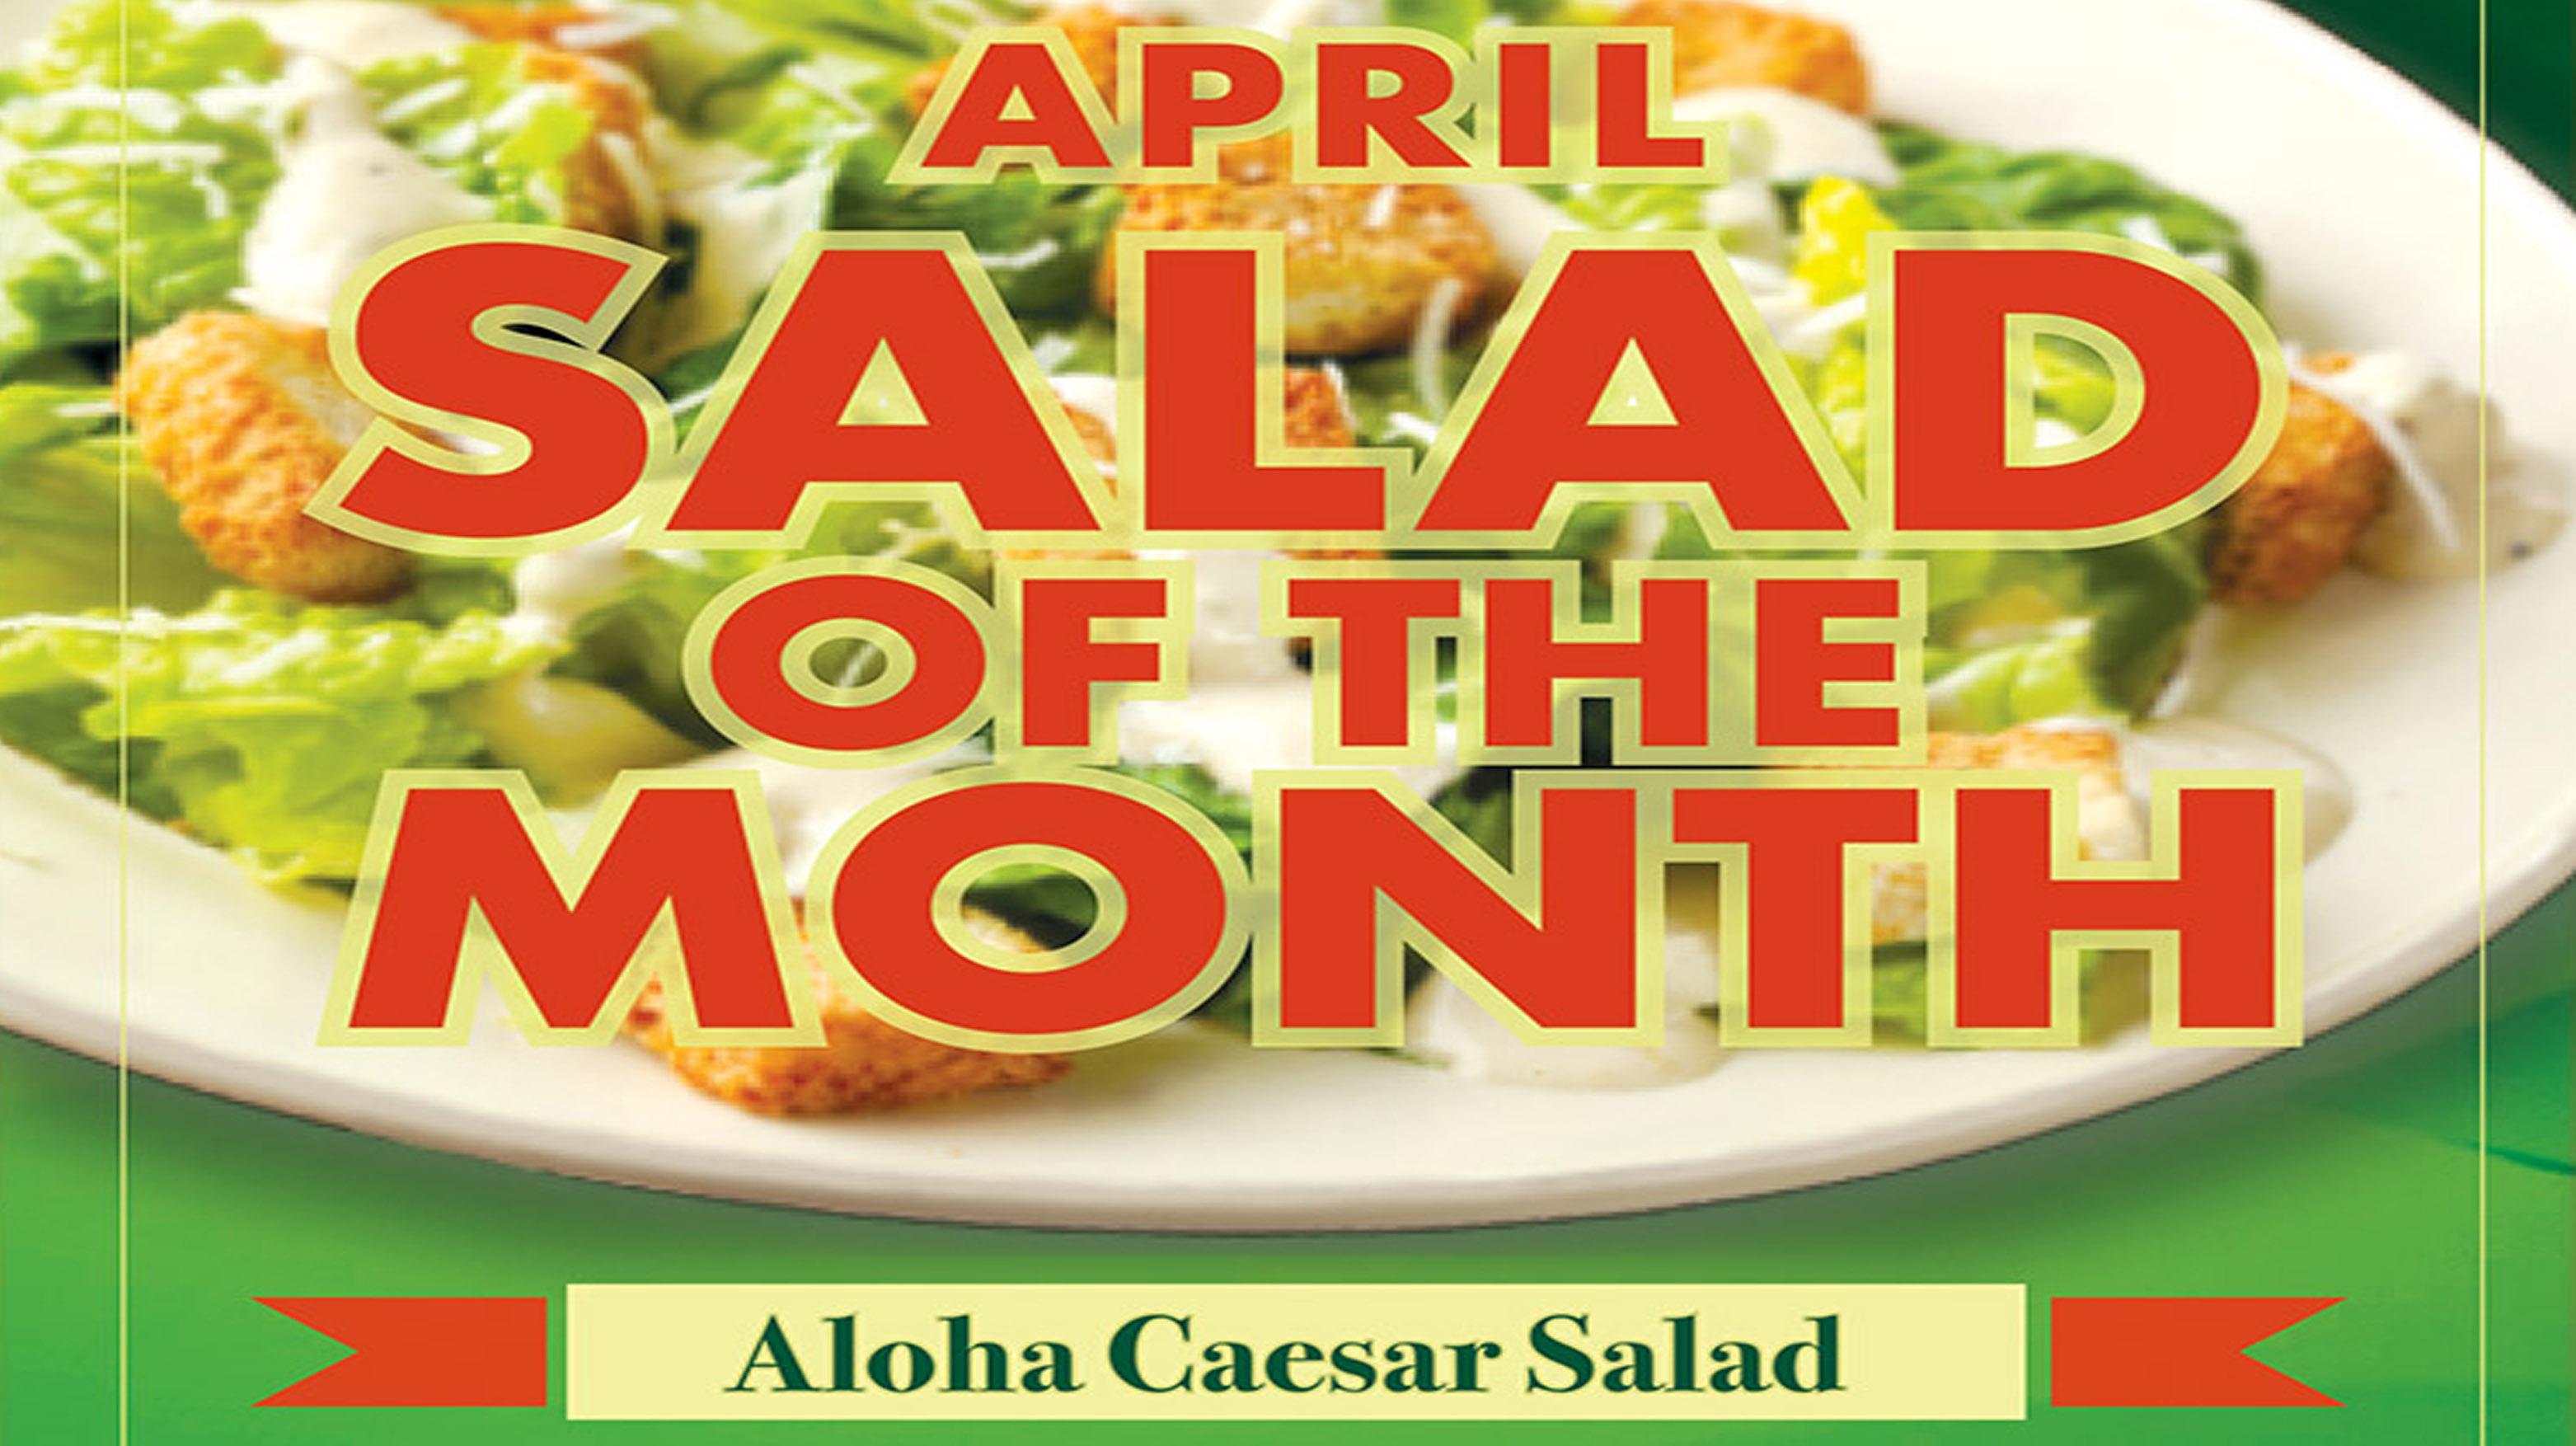 April Salad of the Month: Aloha Caesar